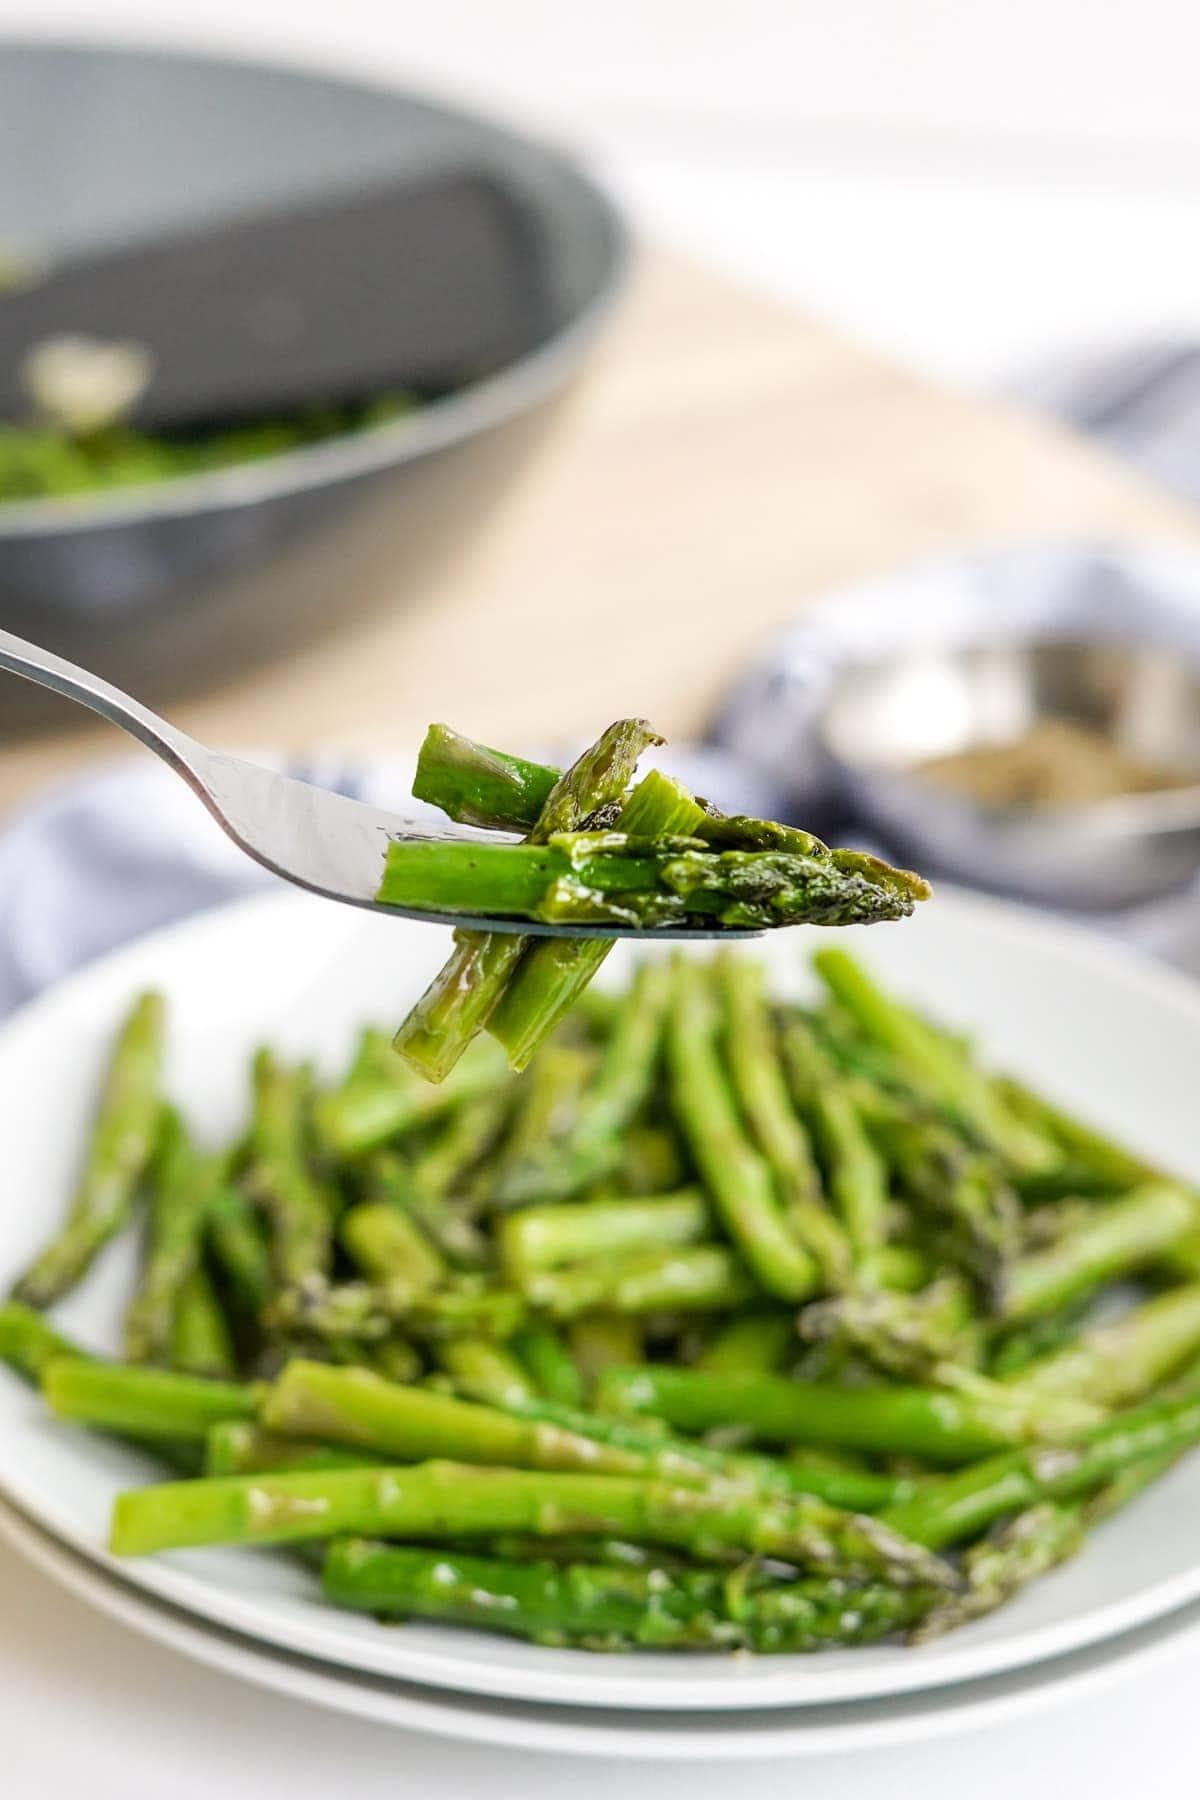 plate of asparagus, fork